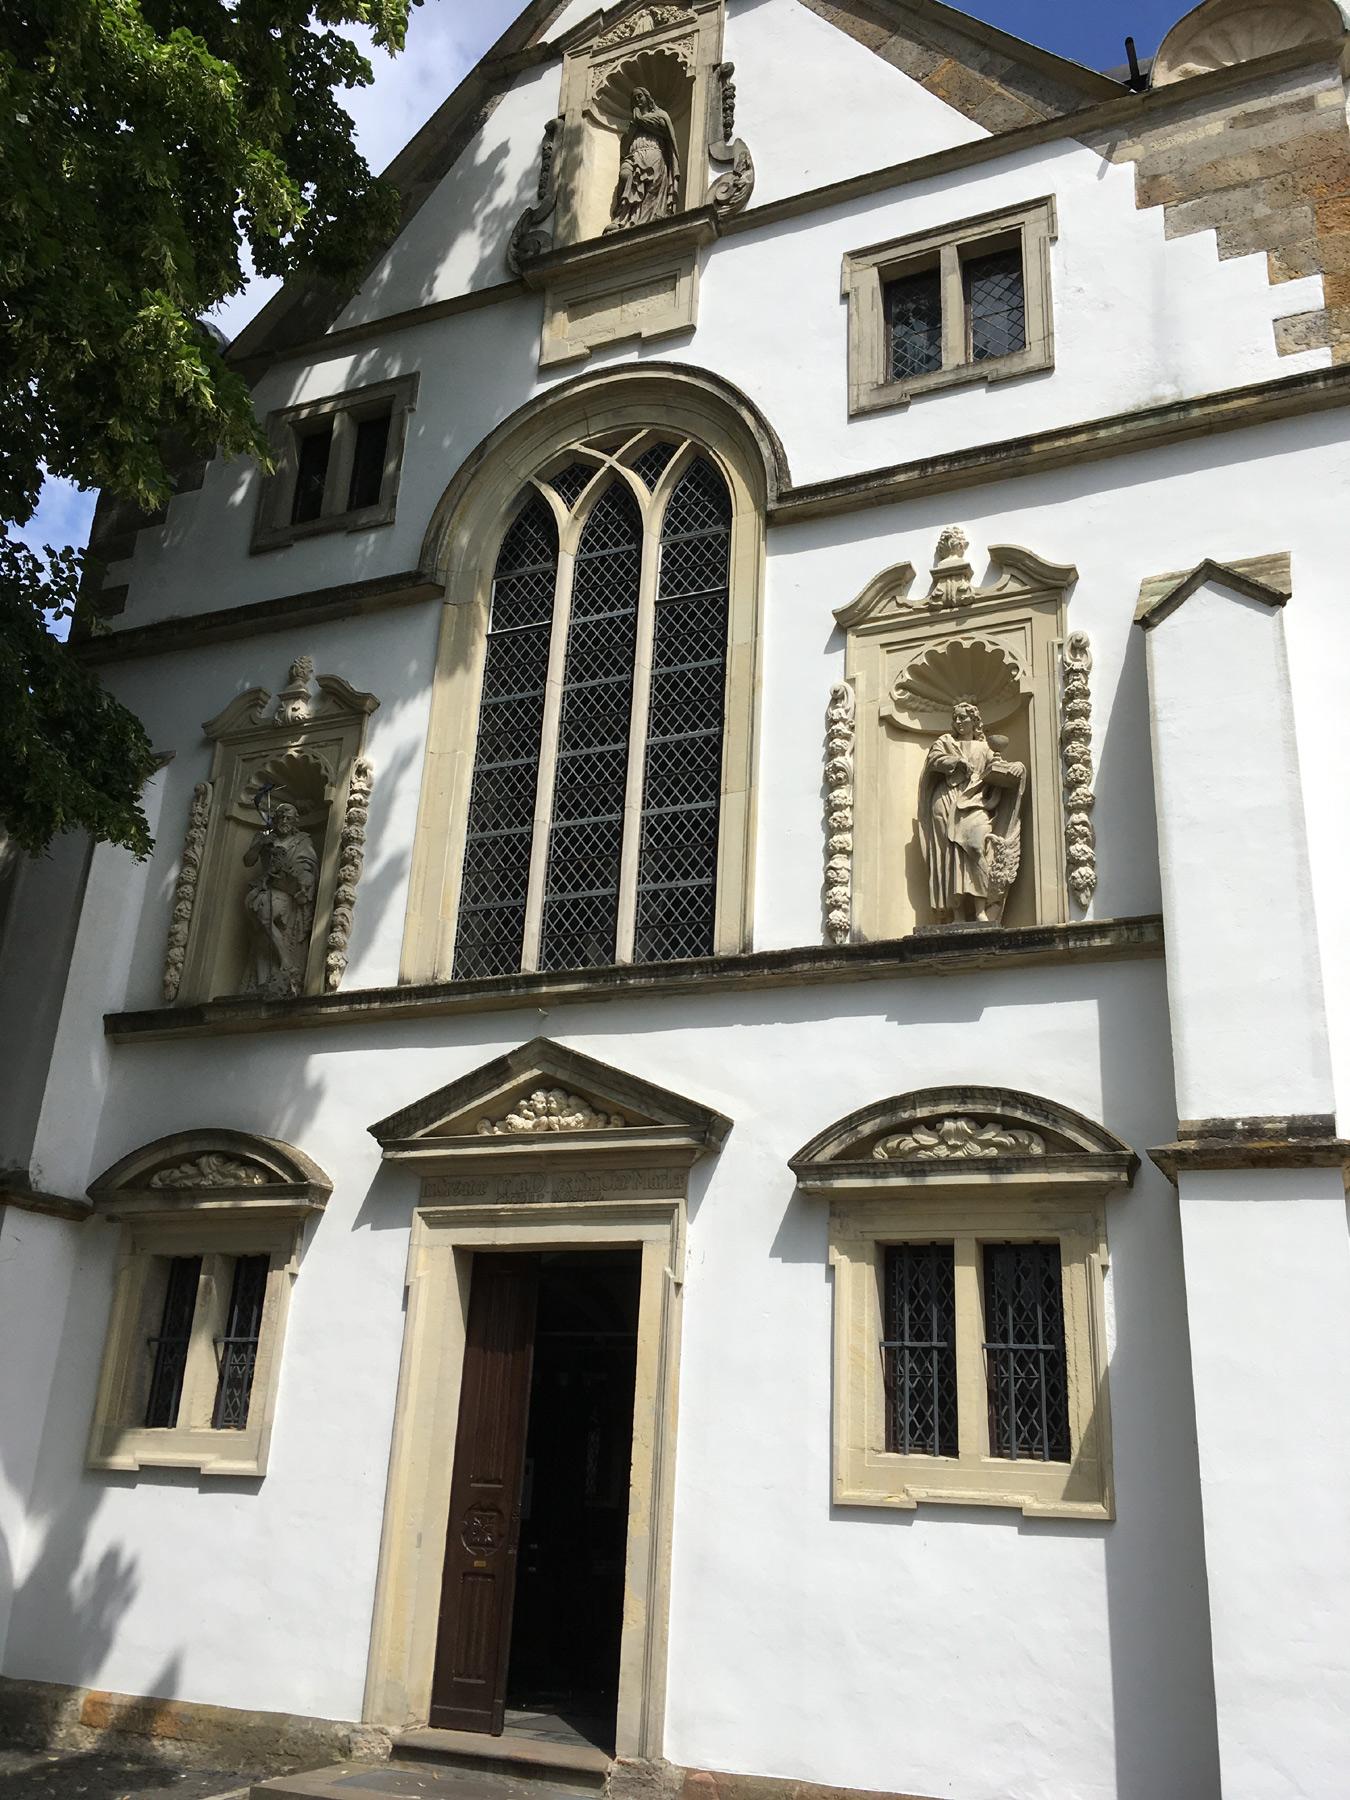 Wallfahrtskirche Vinnenberg